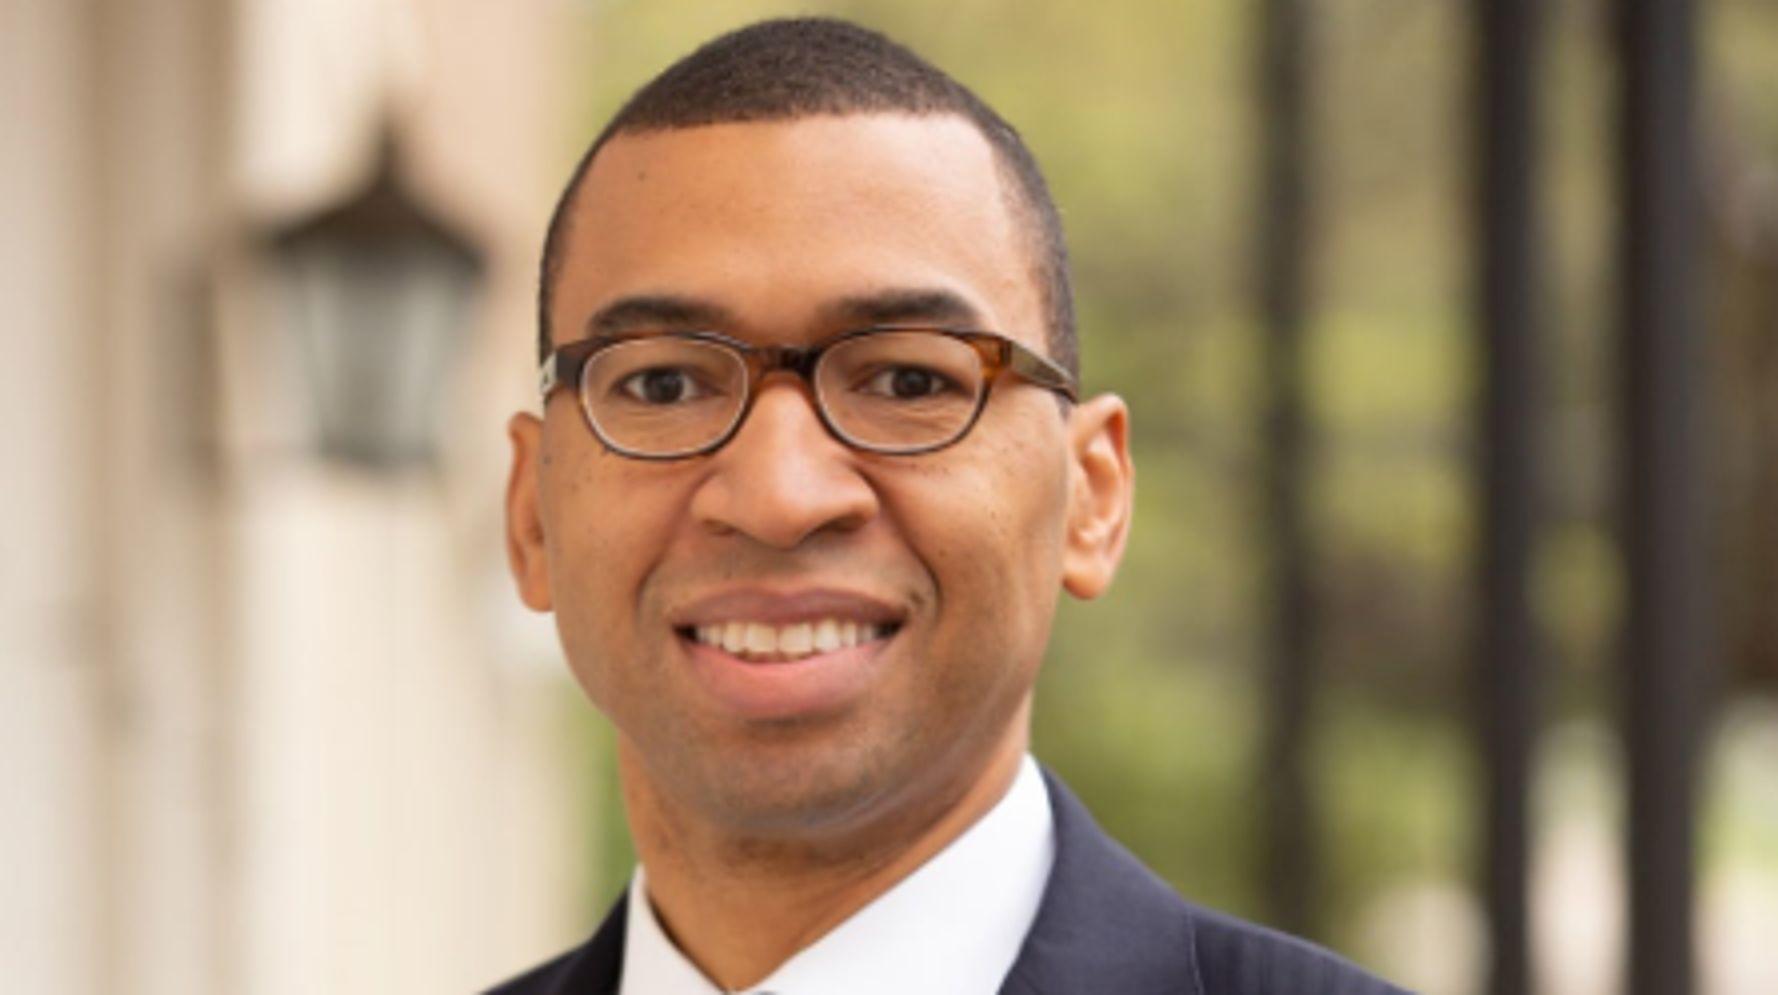 Montgomery, Alabama, Elects Its First Black Mayor